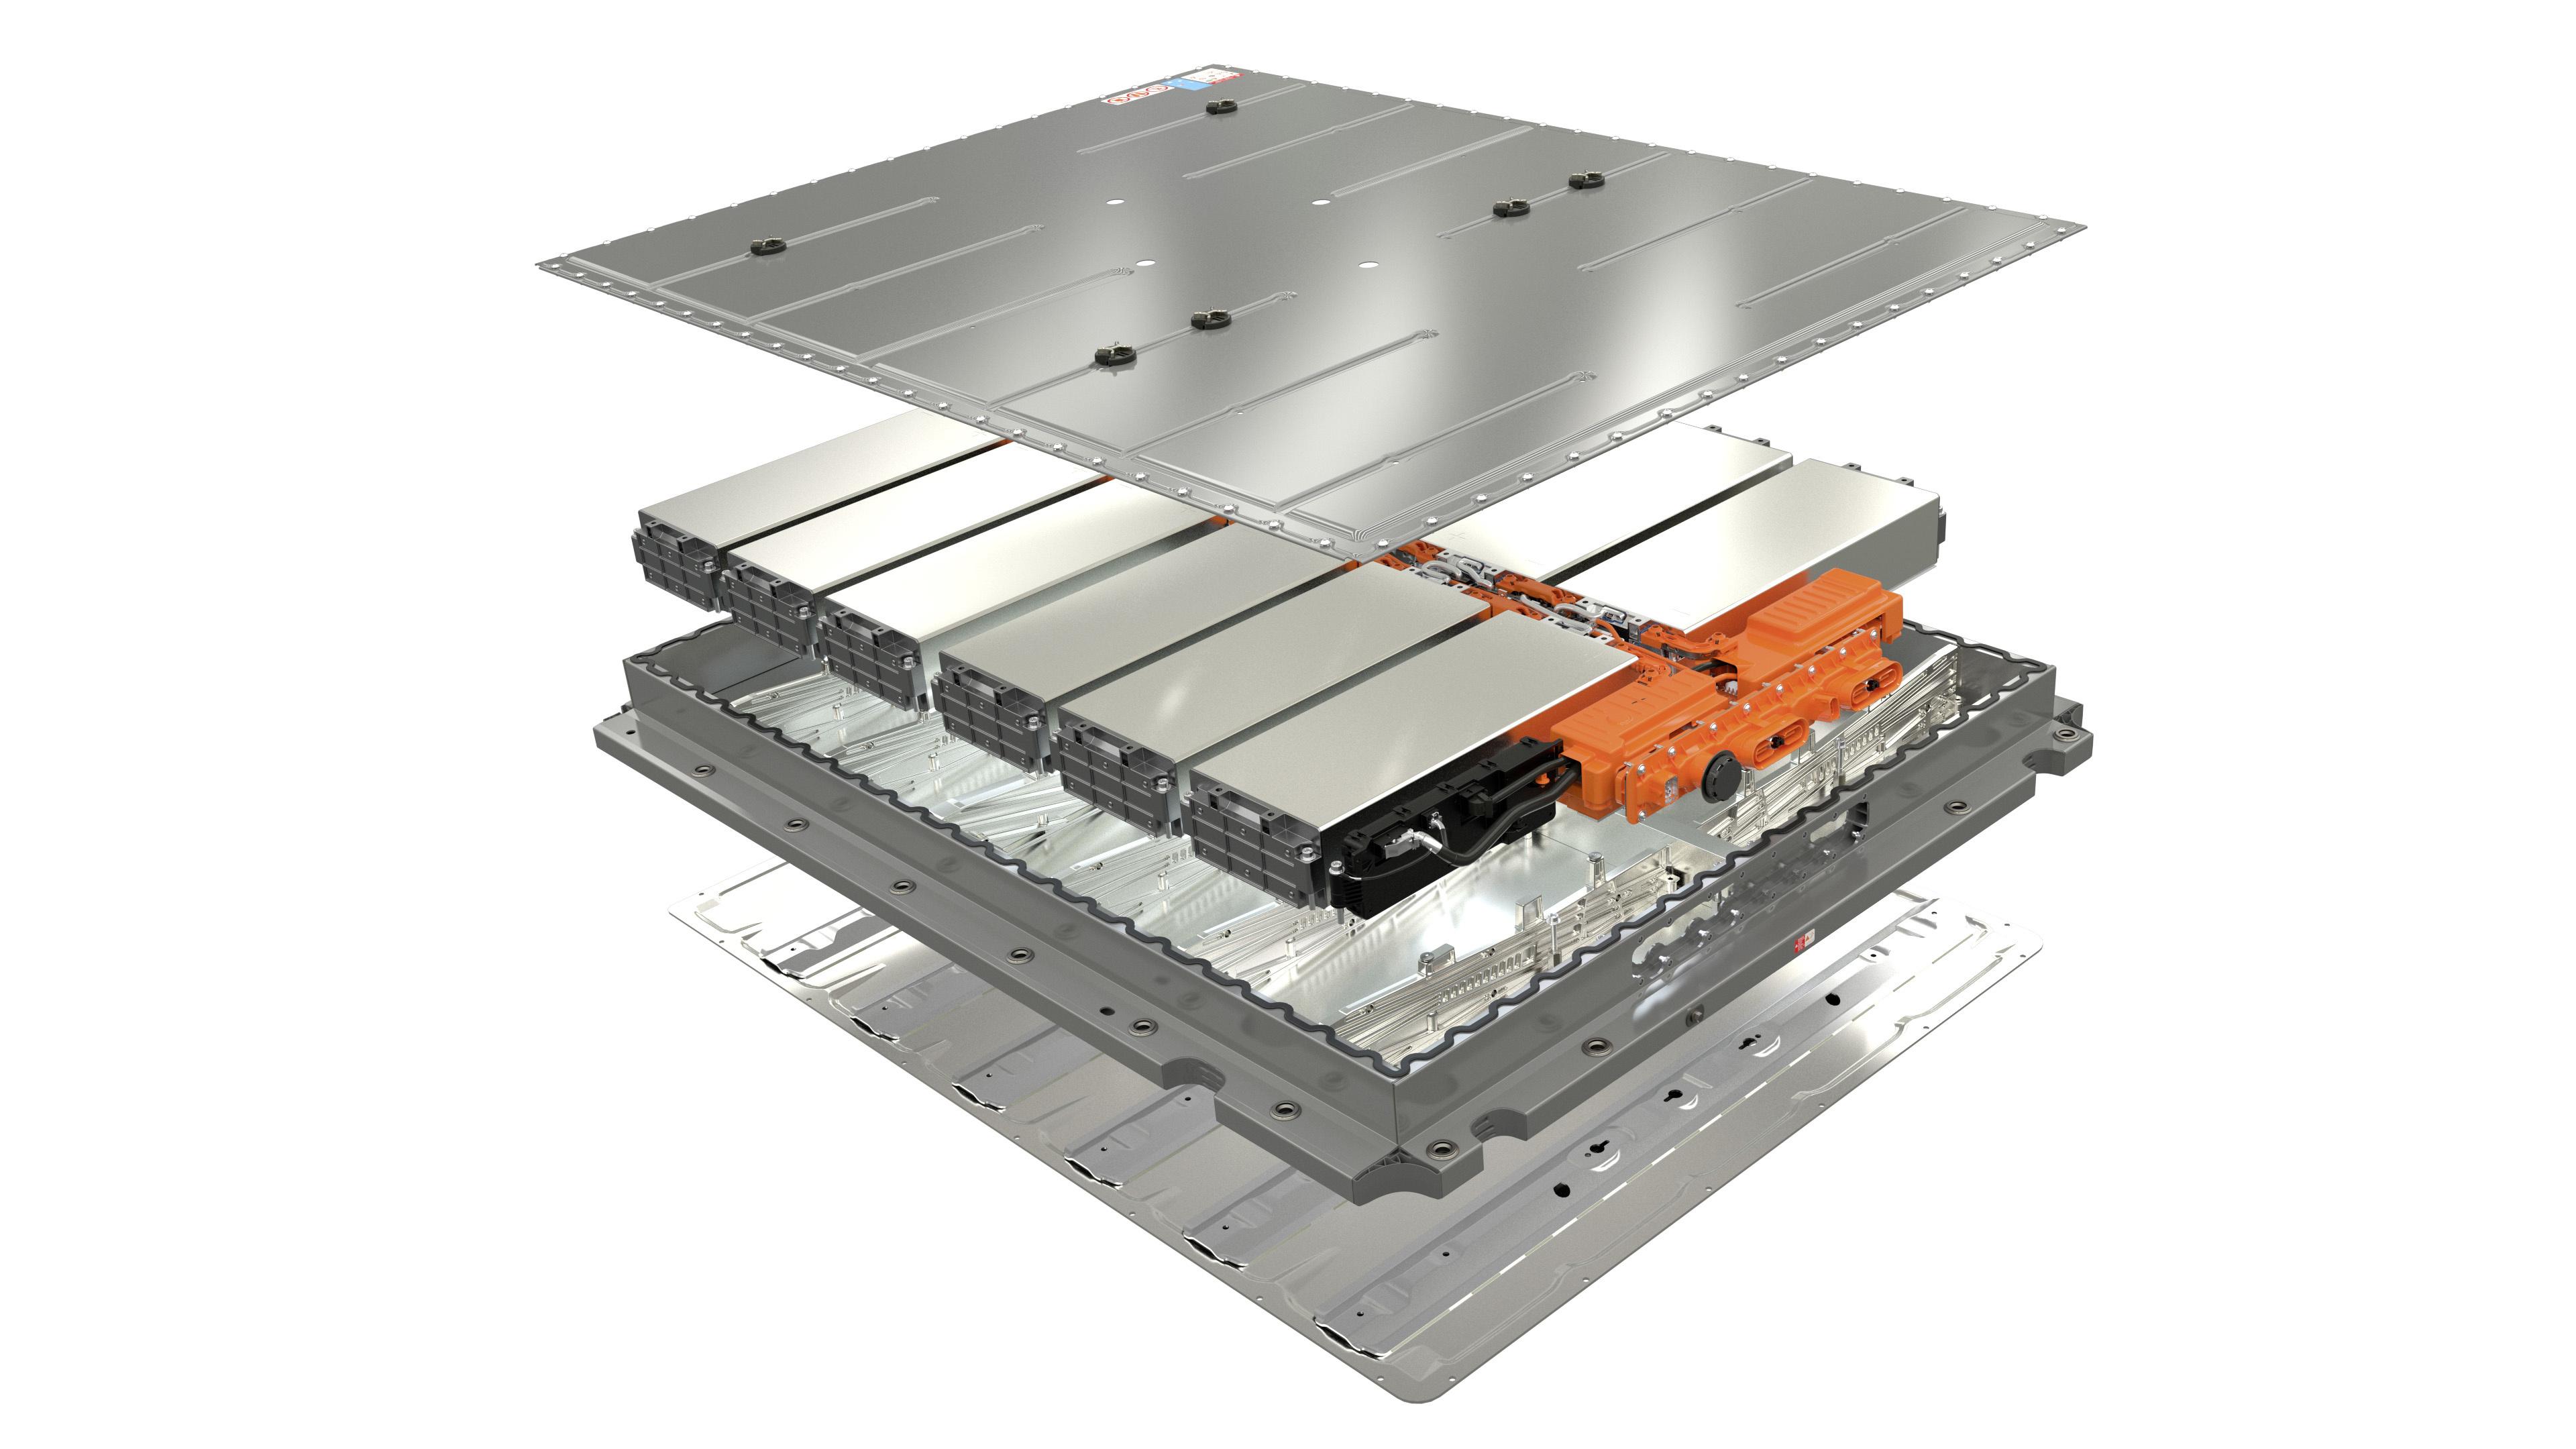 Battery diagram from Volkswagen Group